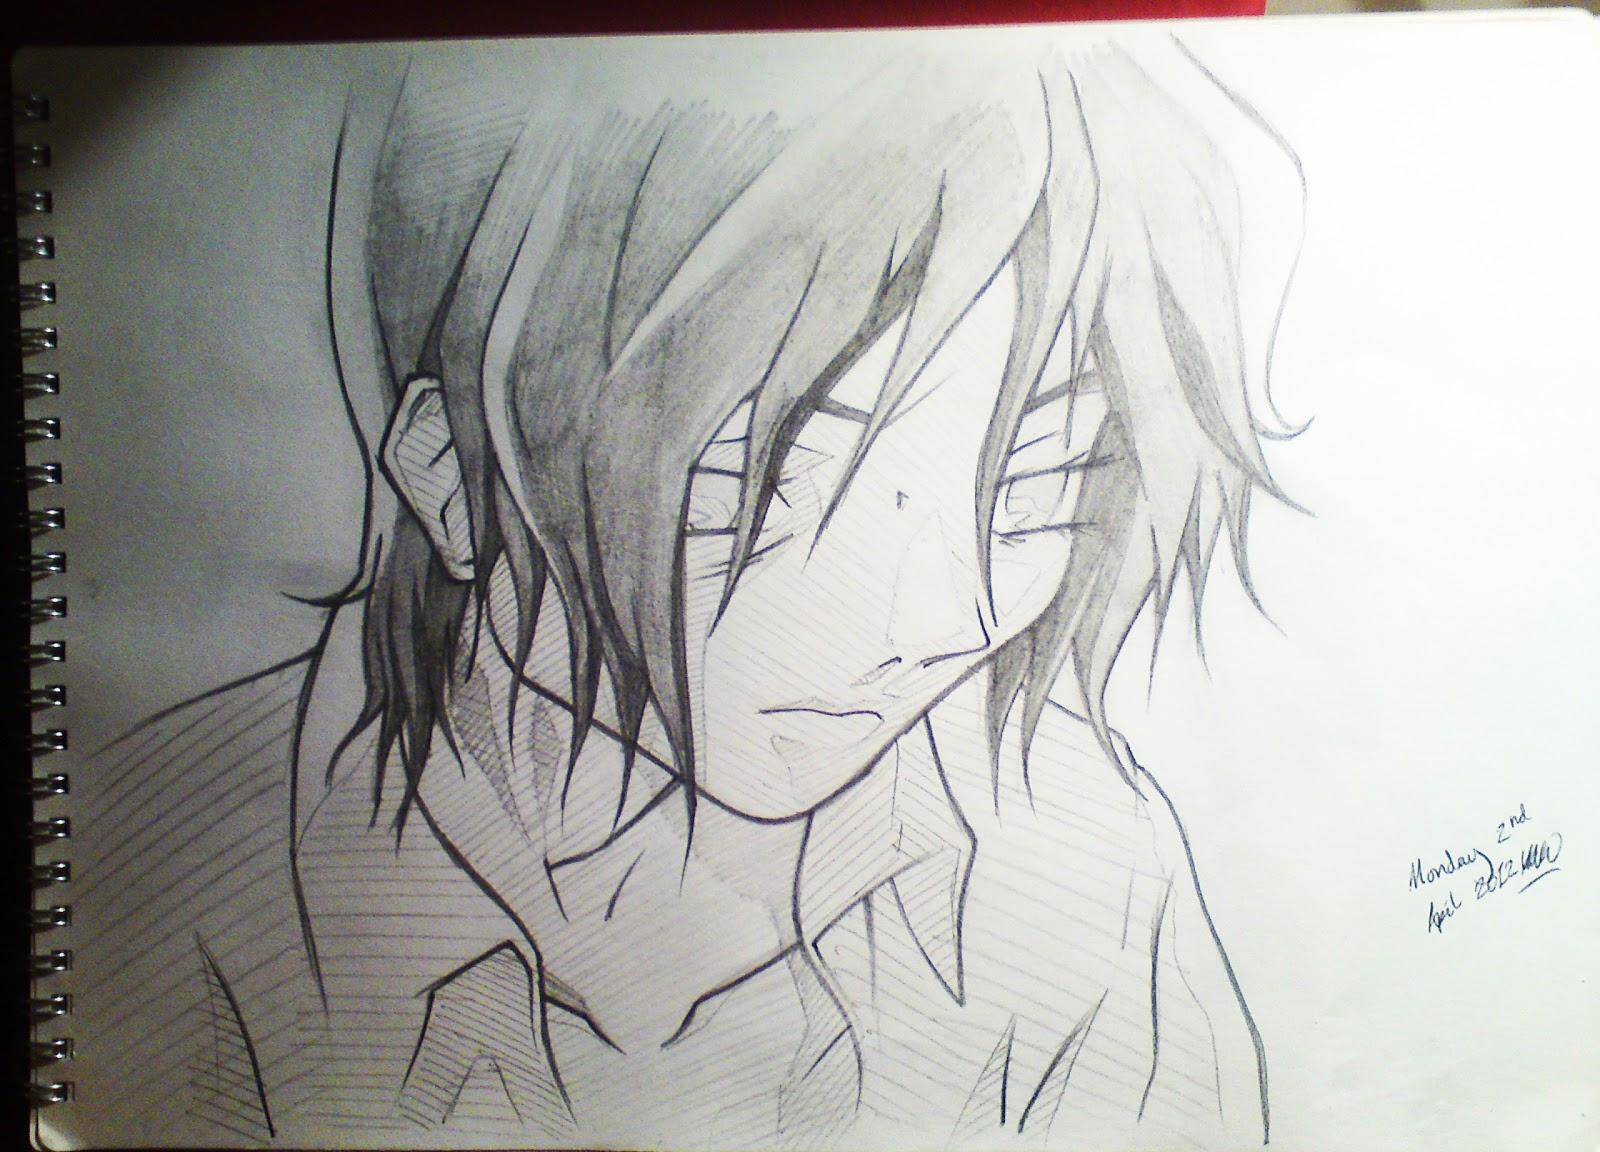 Day 64 monday 2nd april 2012 sad anime boy